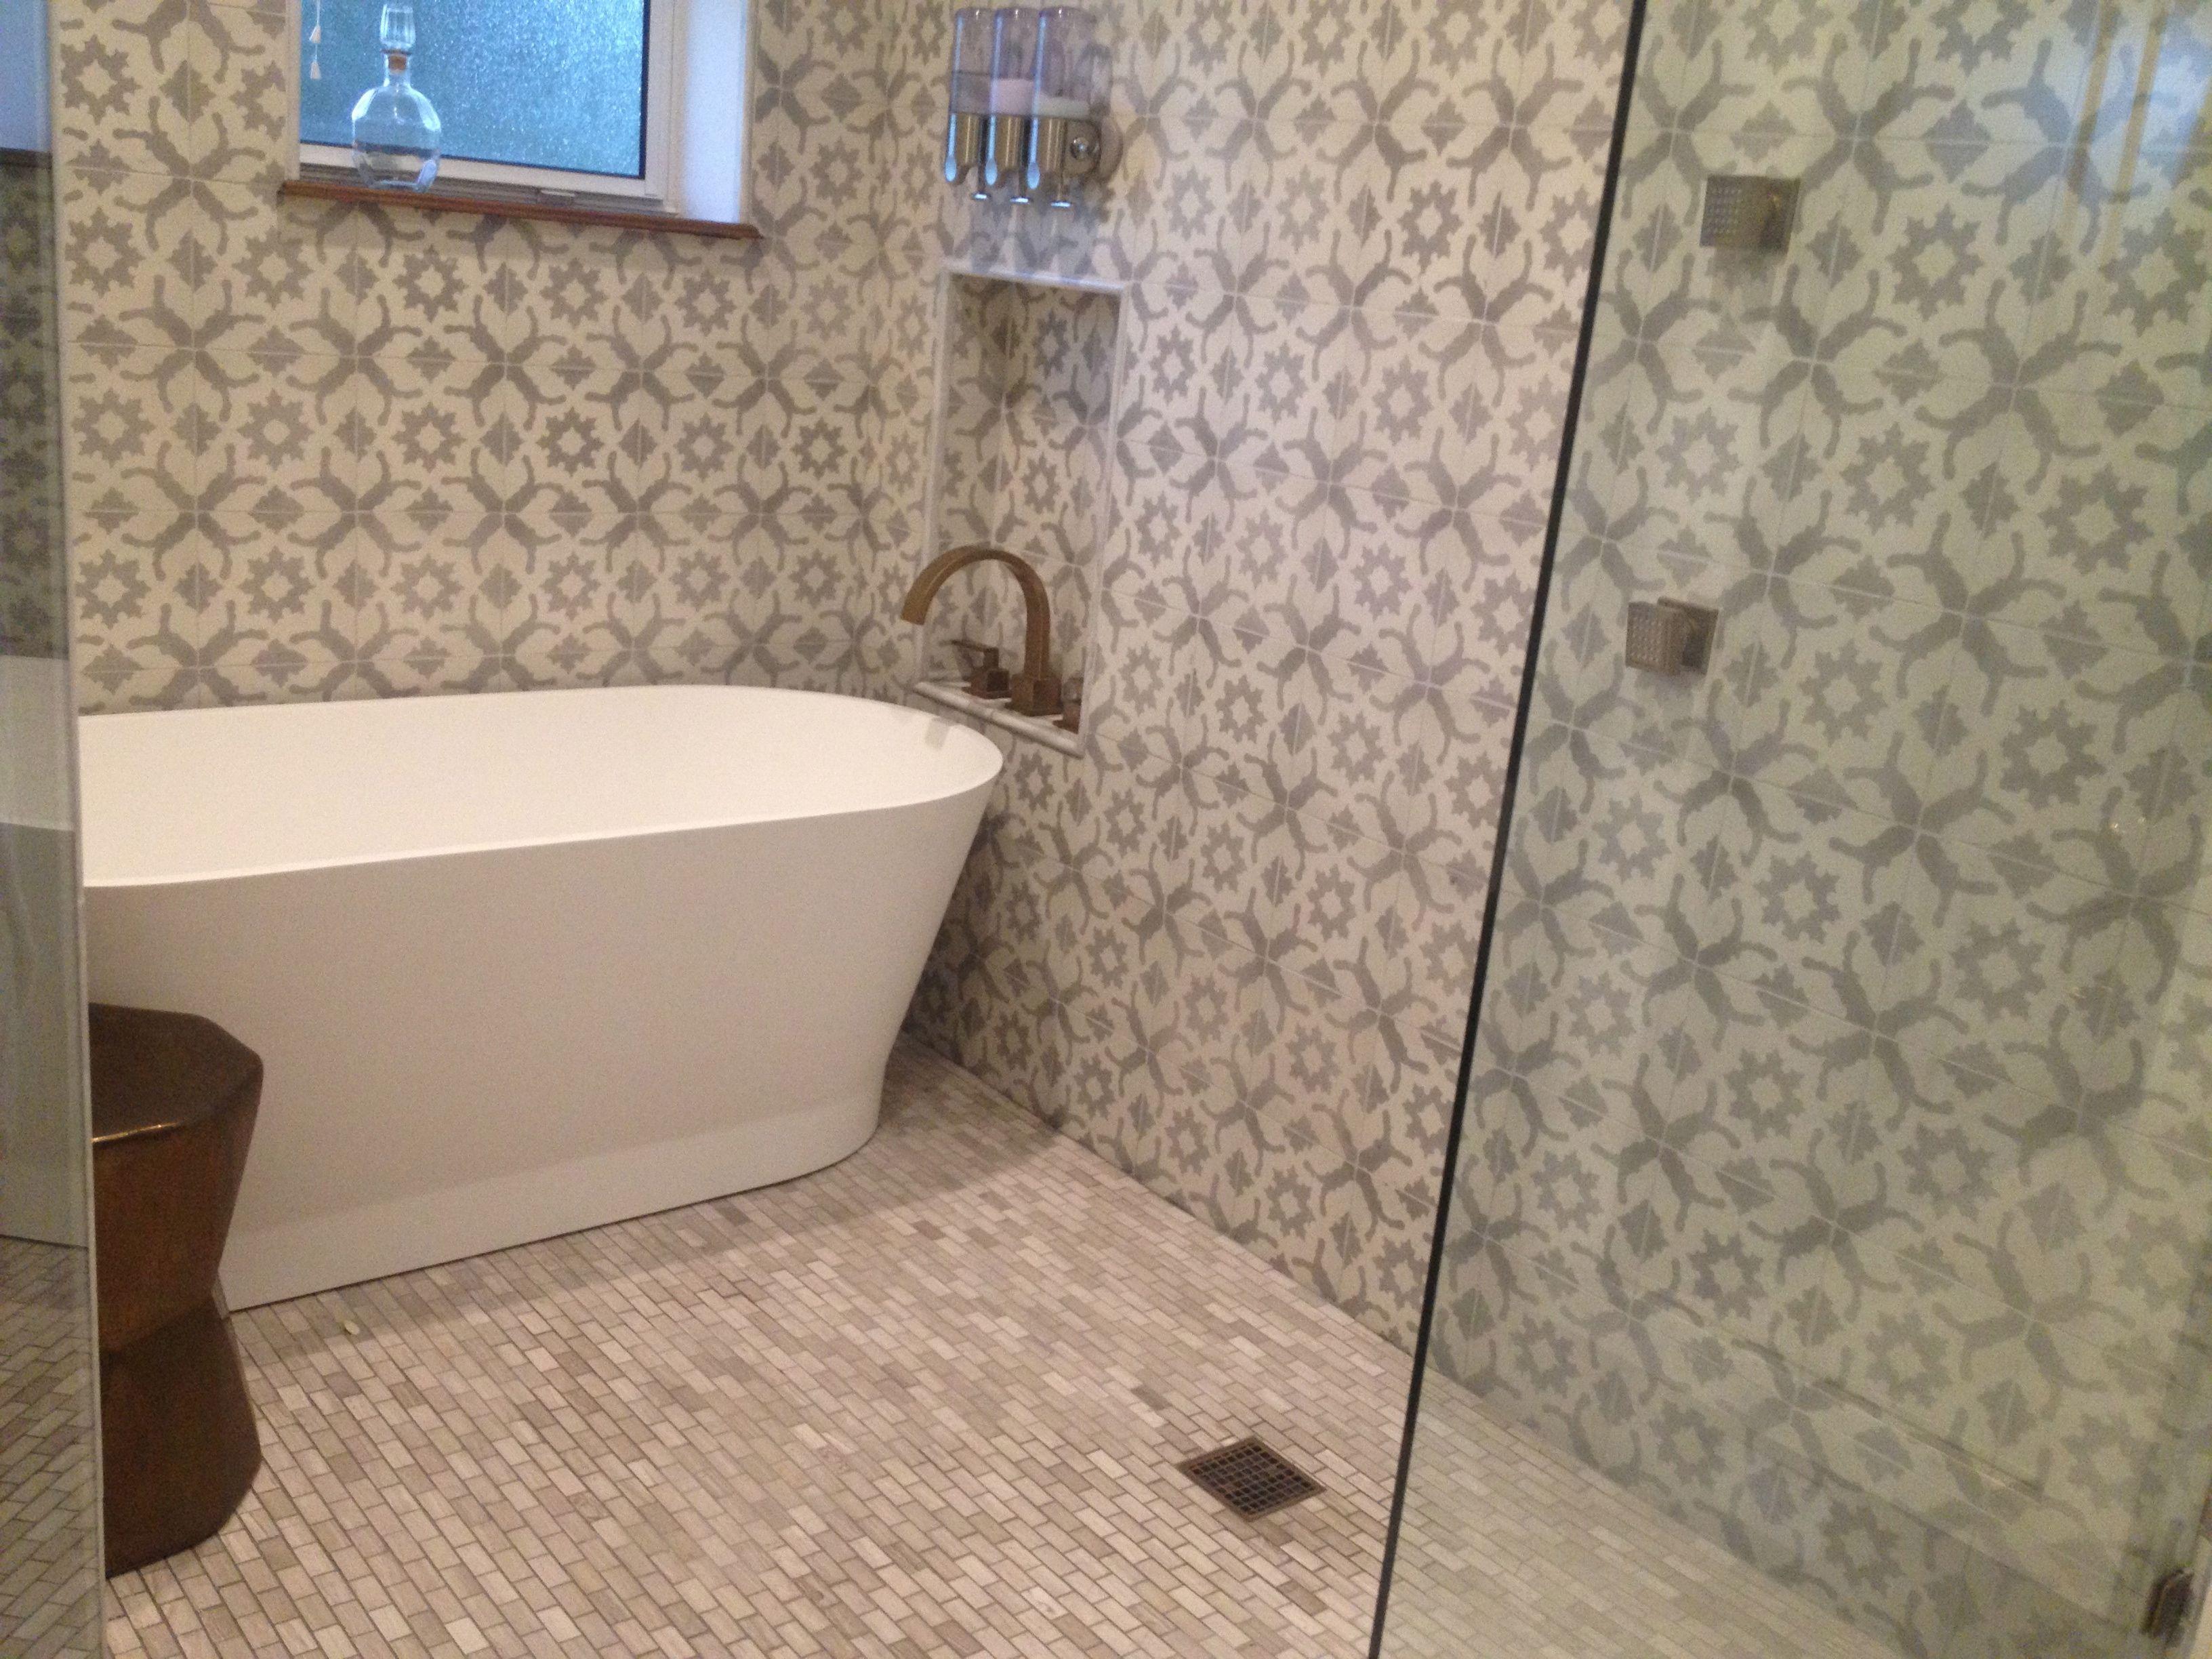 Bathroom renovation encaustic tile cuban tile large for Wet wall bathroom design